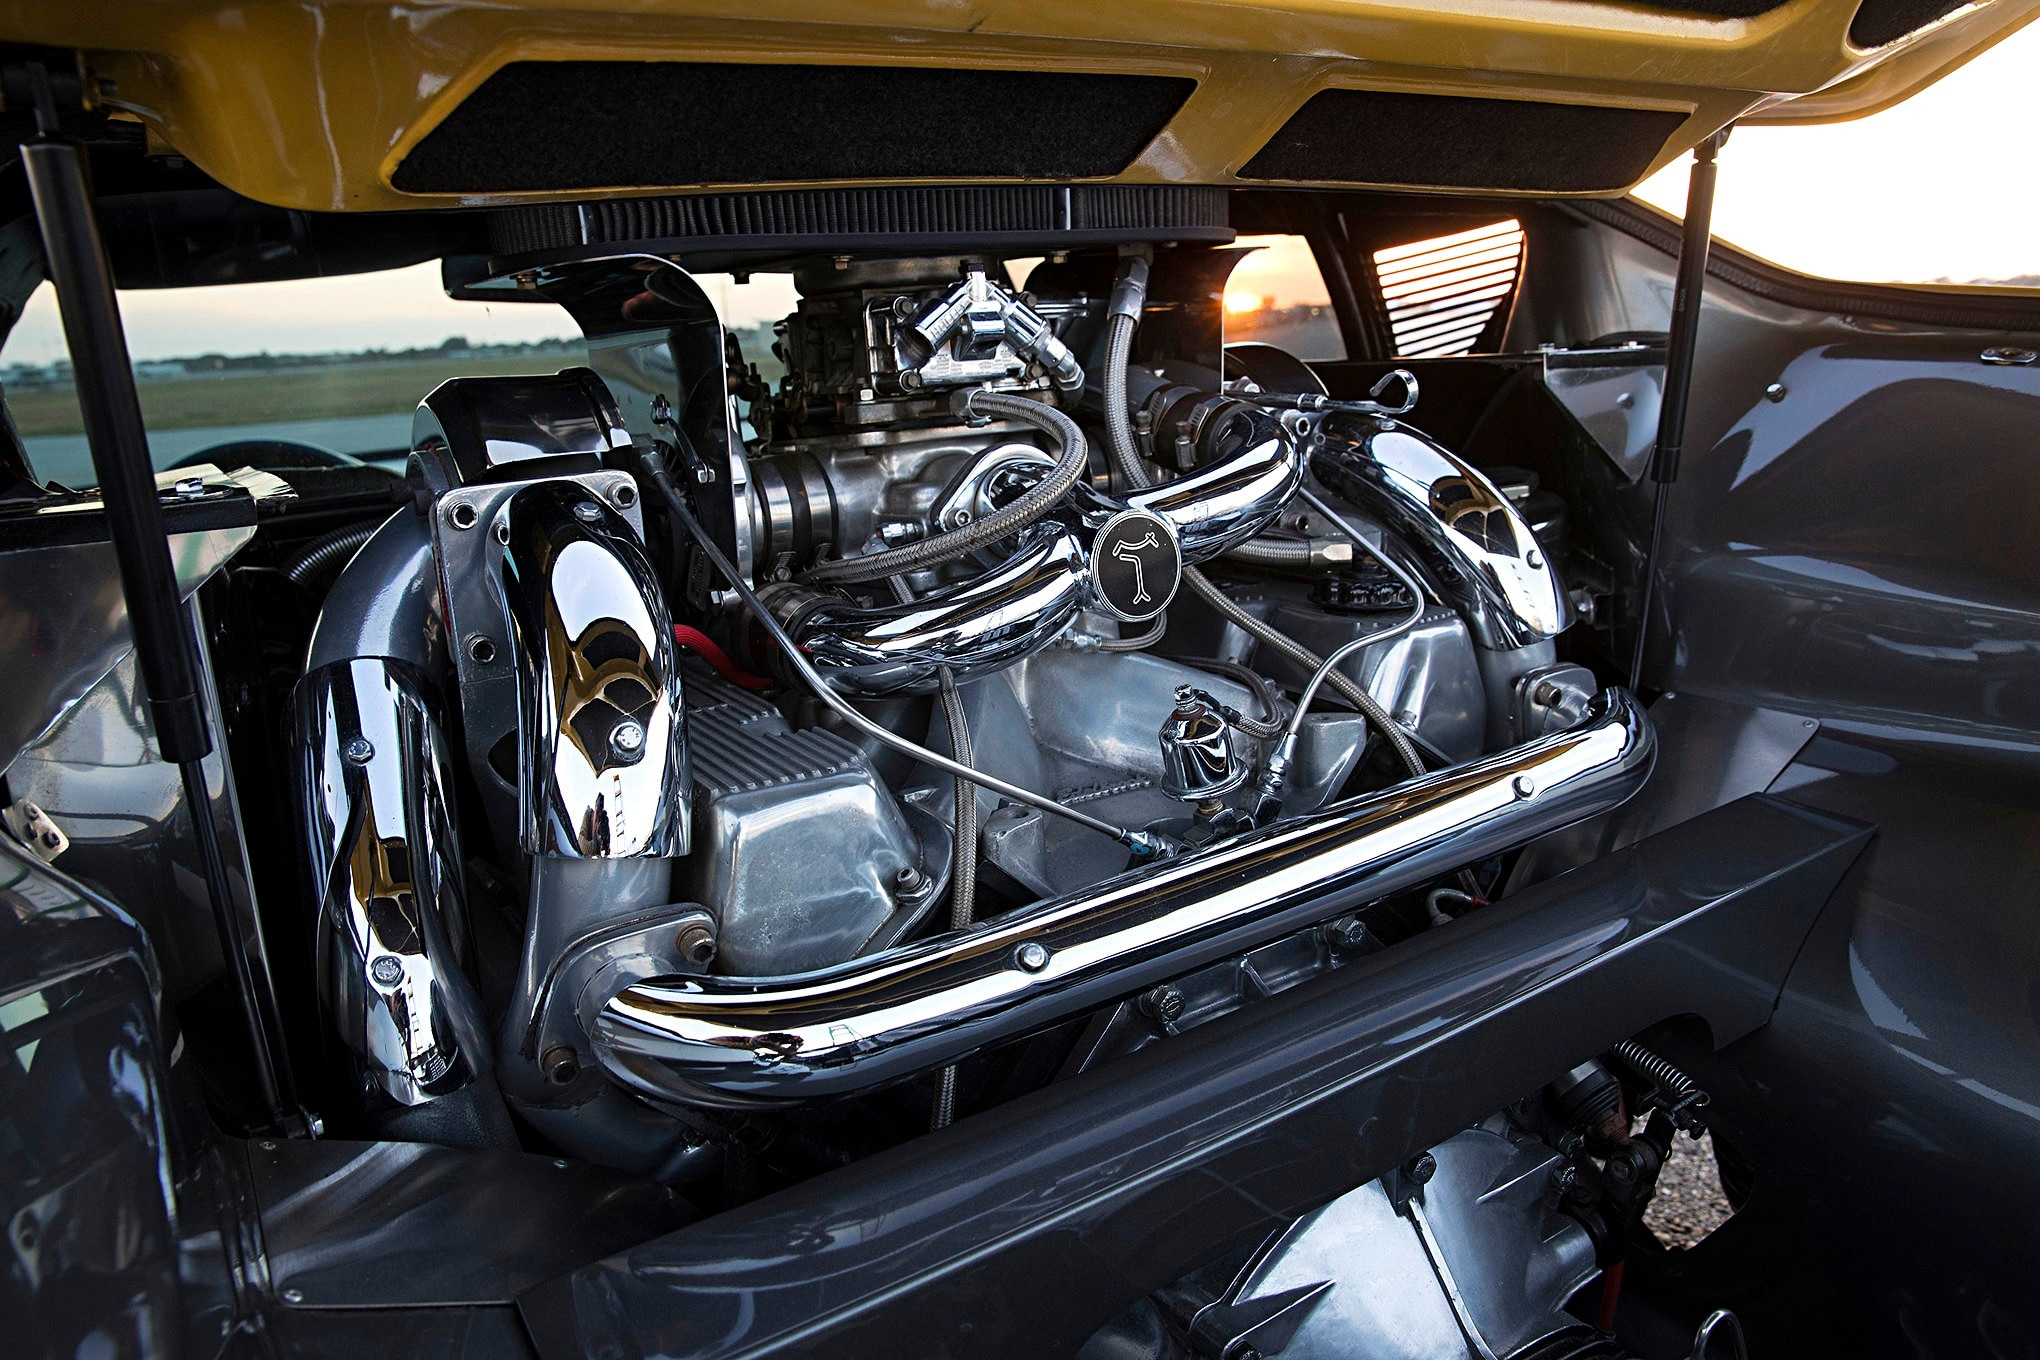 006 1974 Pantera Engine